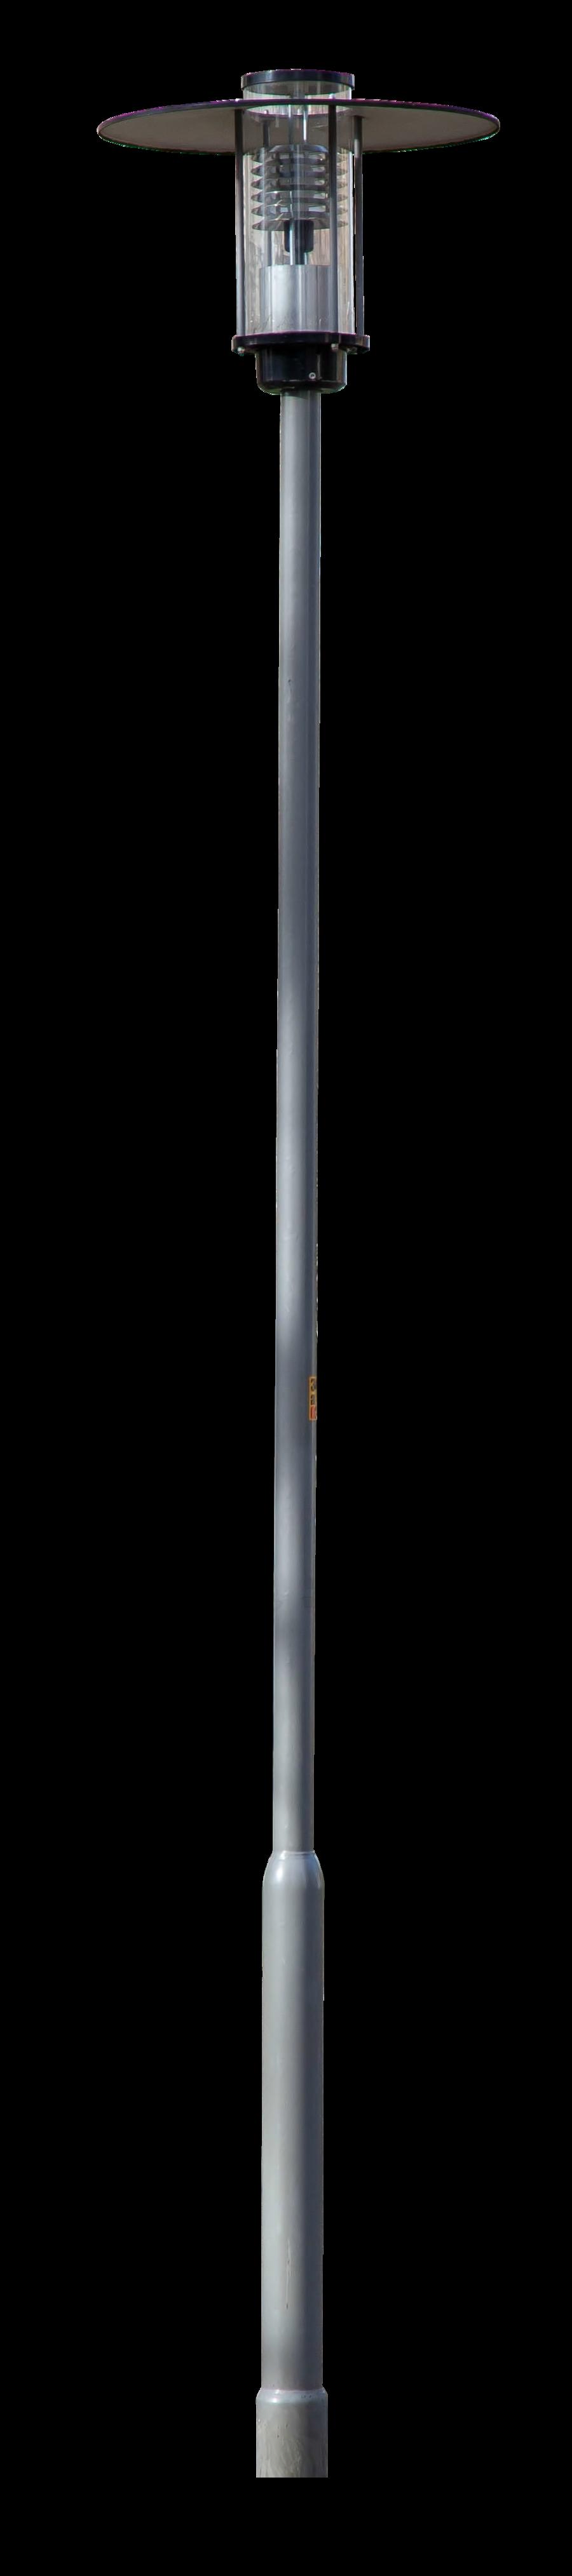 Streetlamp HD PNG - 119916